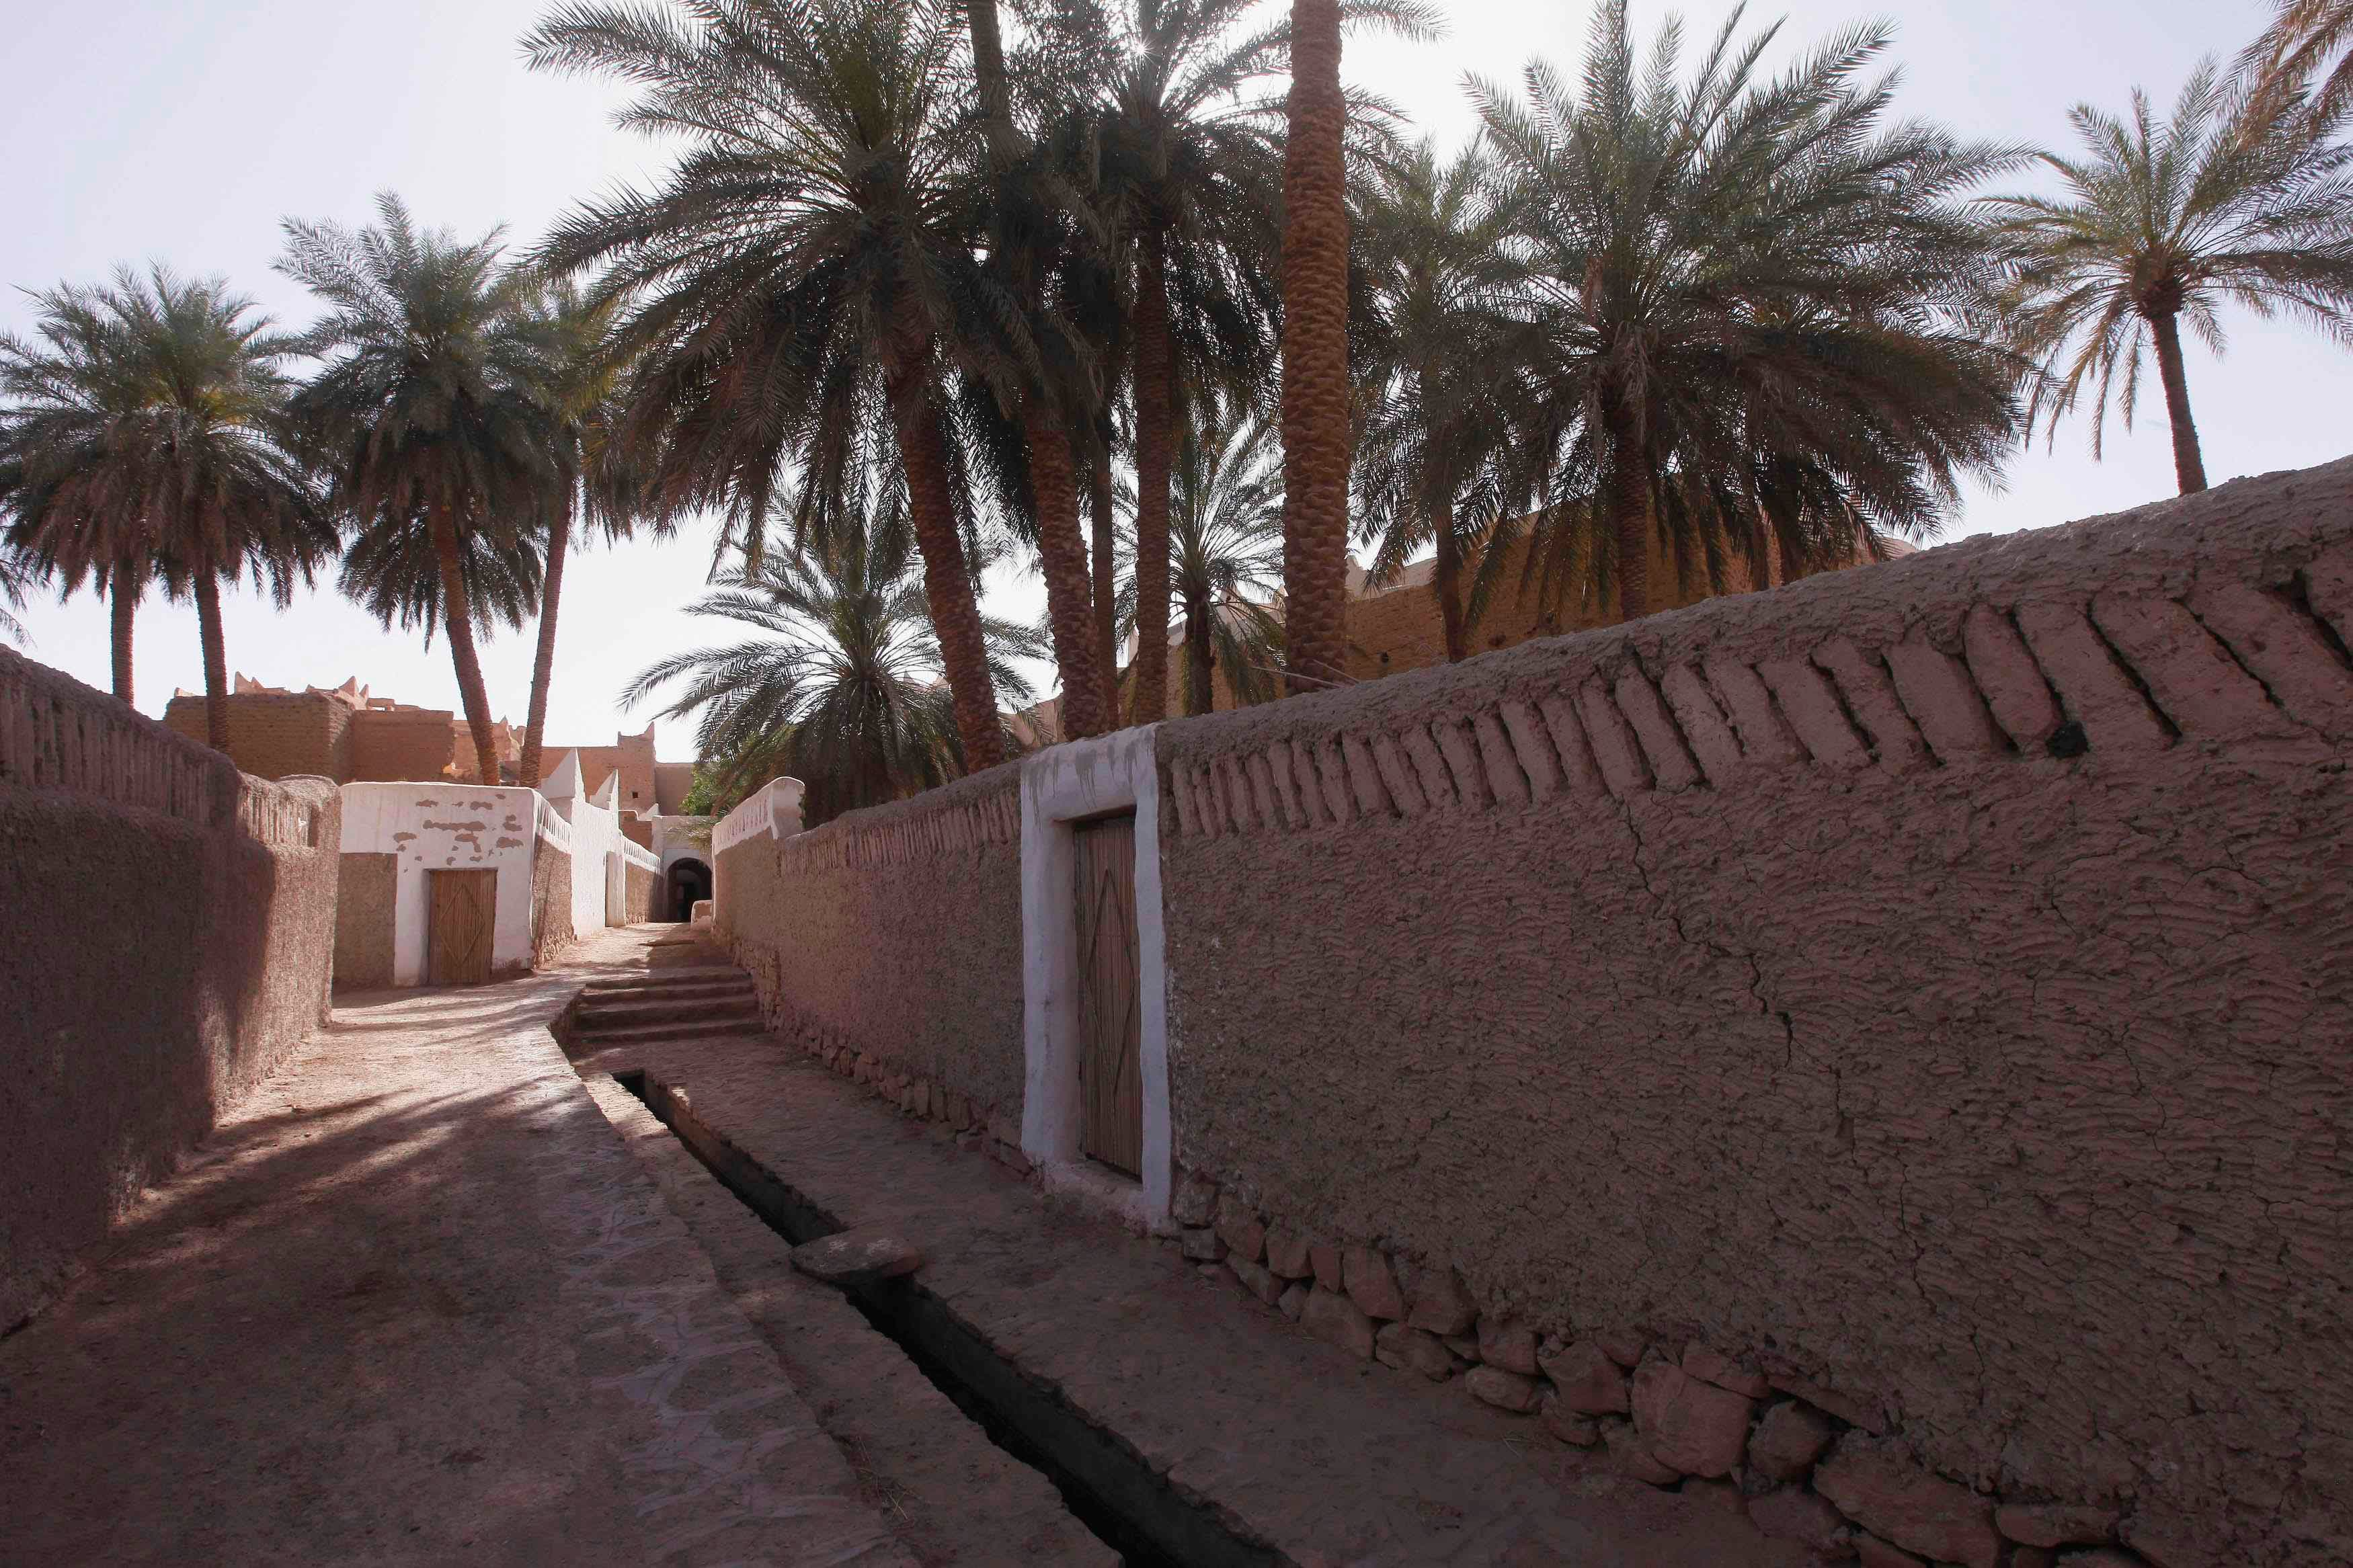 A waterway runs through a garden inside the the Libyan desert oasis town of Ghadames, a UNESCO World Heritage site (Reuters)